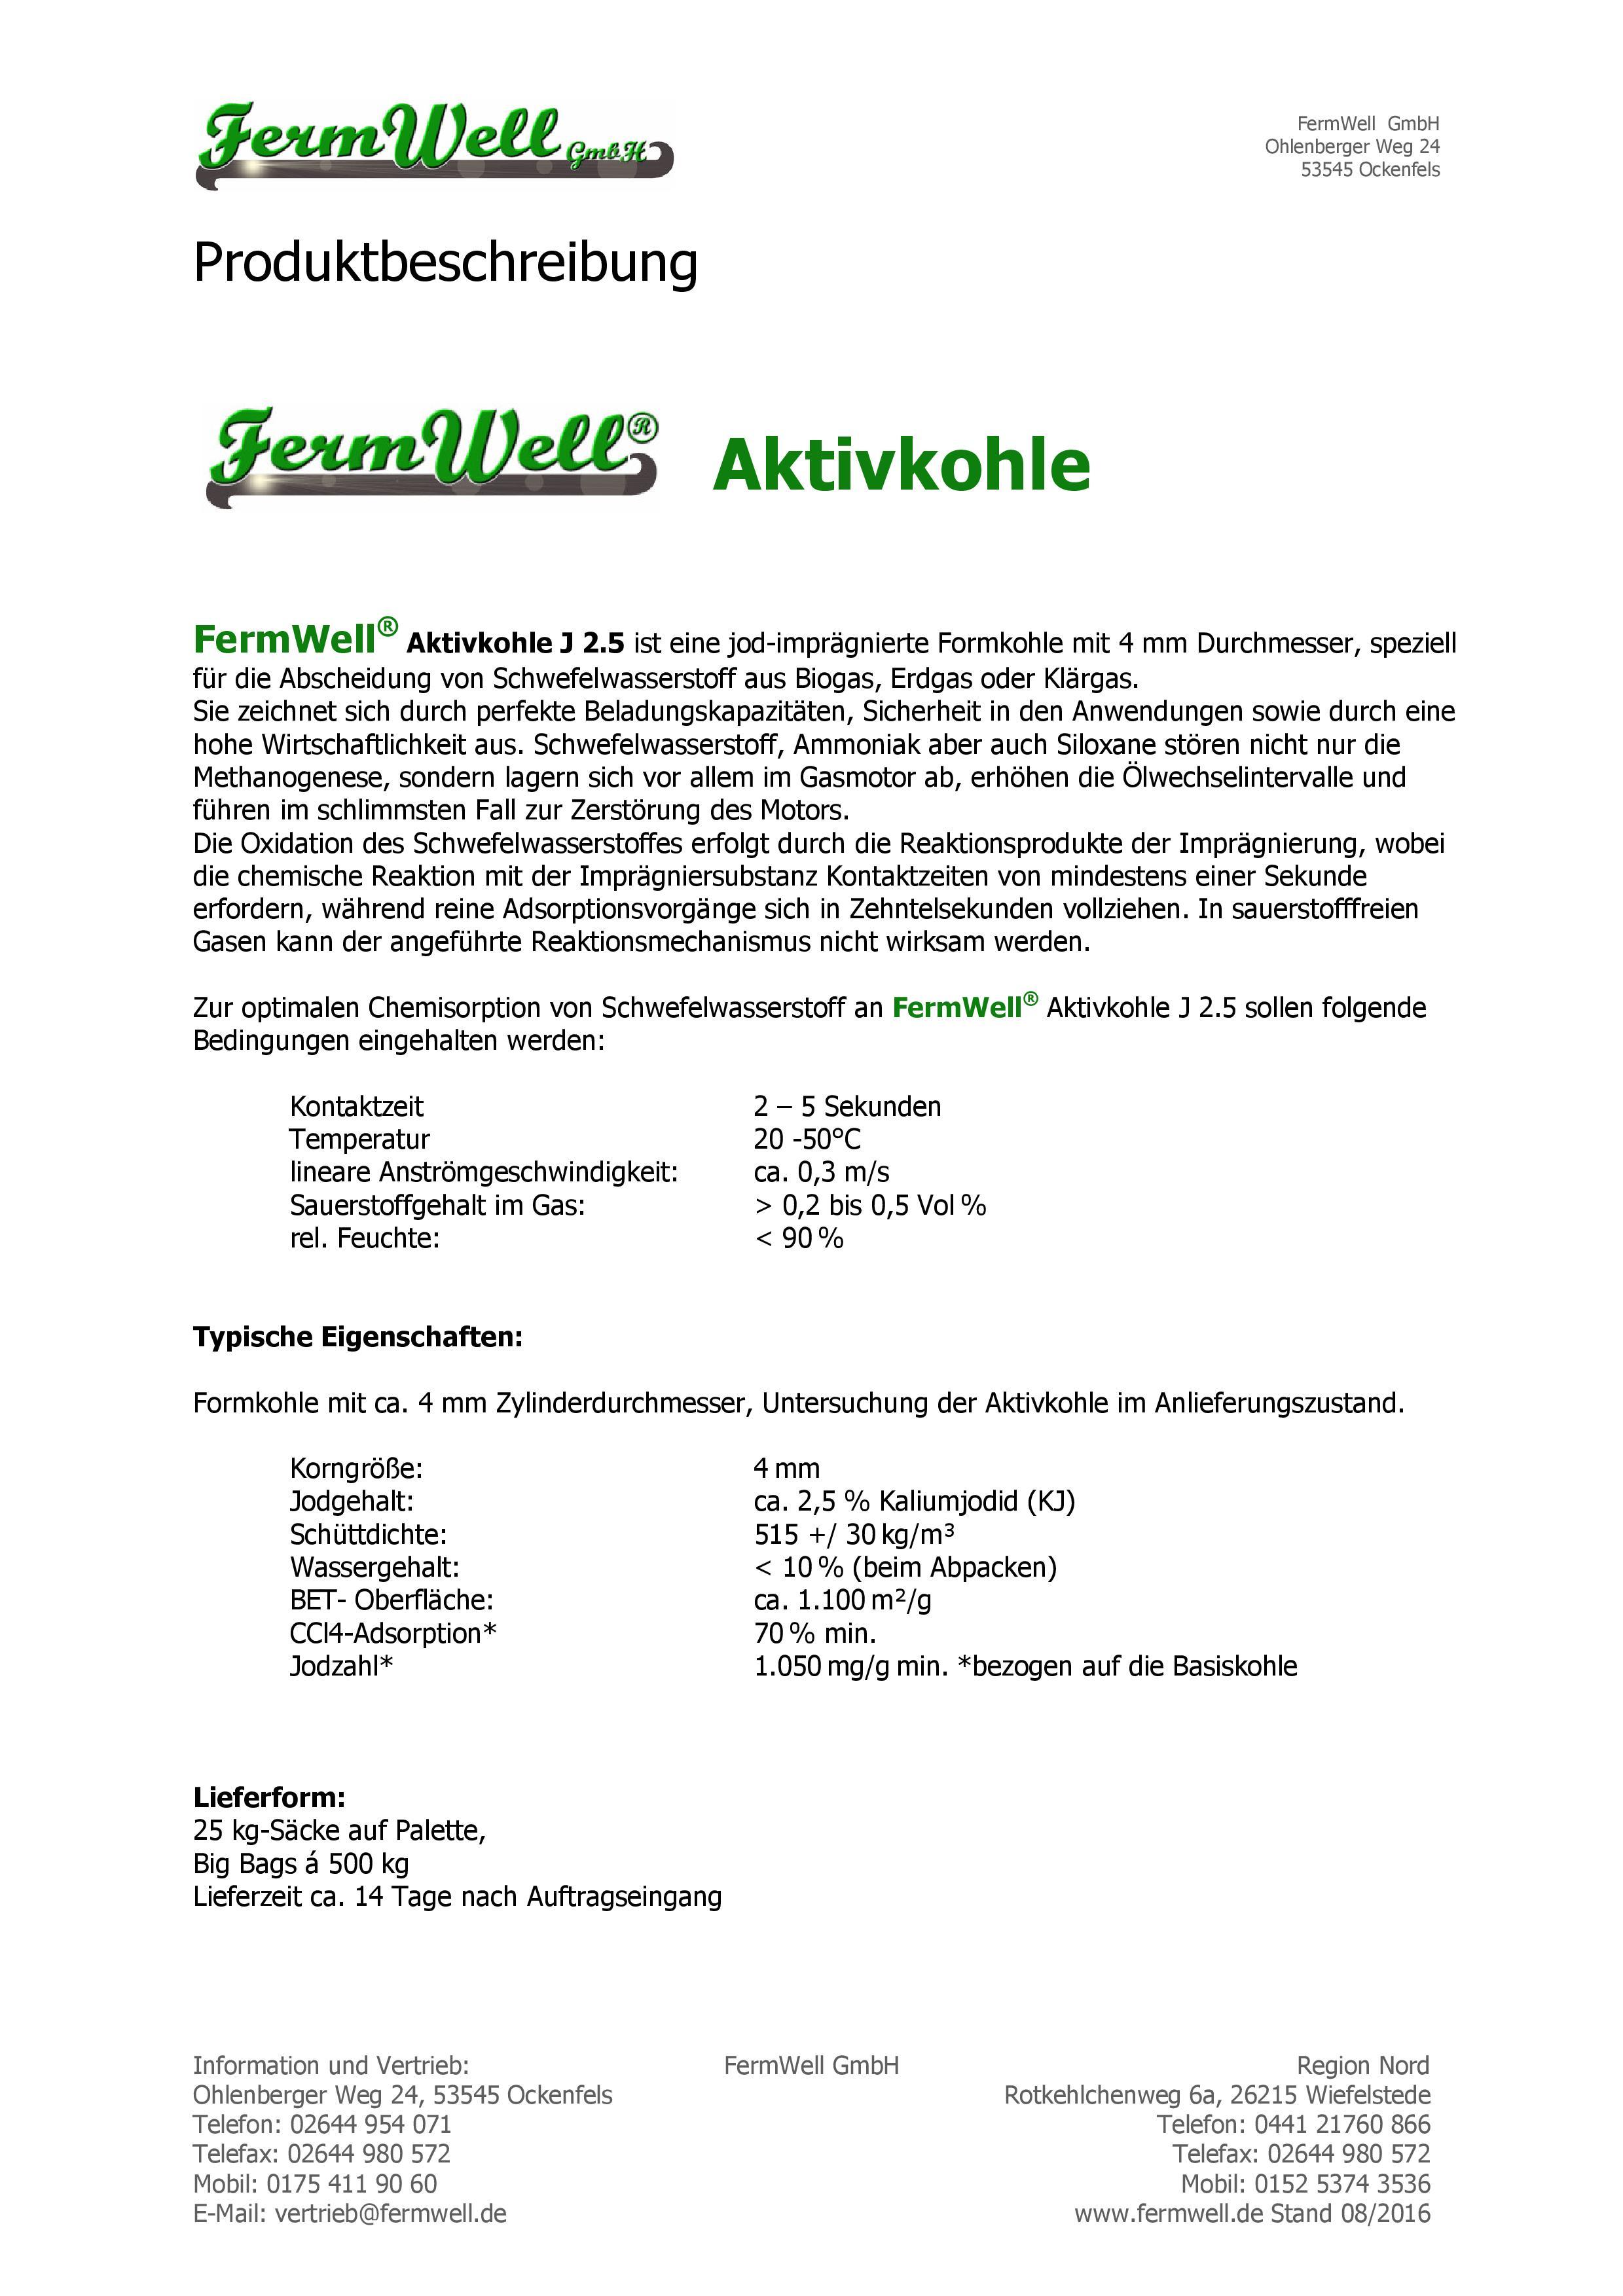 FWG_Aktivkohle_J2.5_Produktbeschreib_161